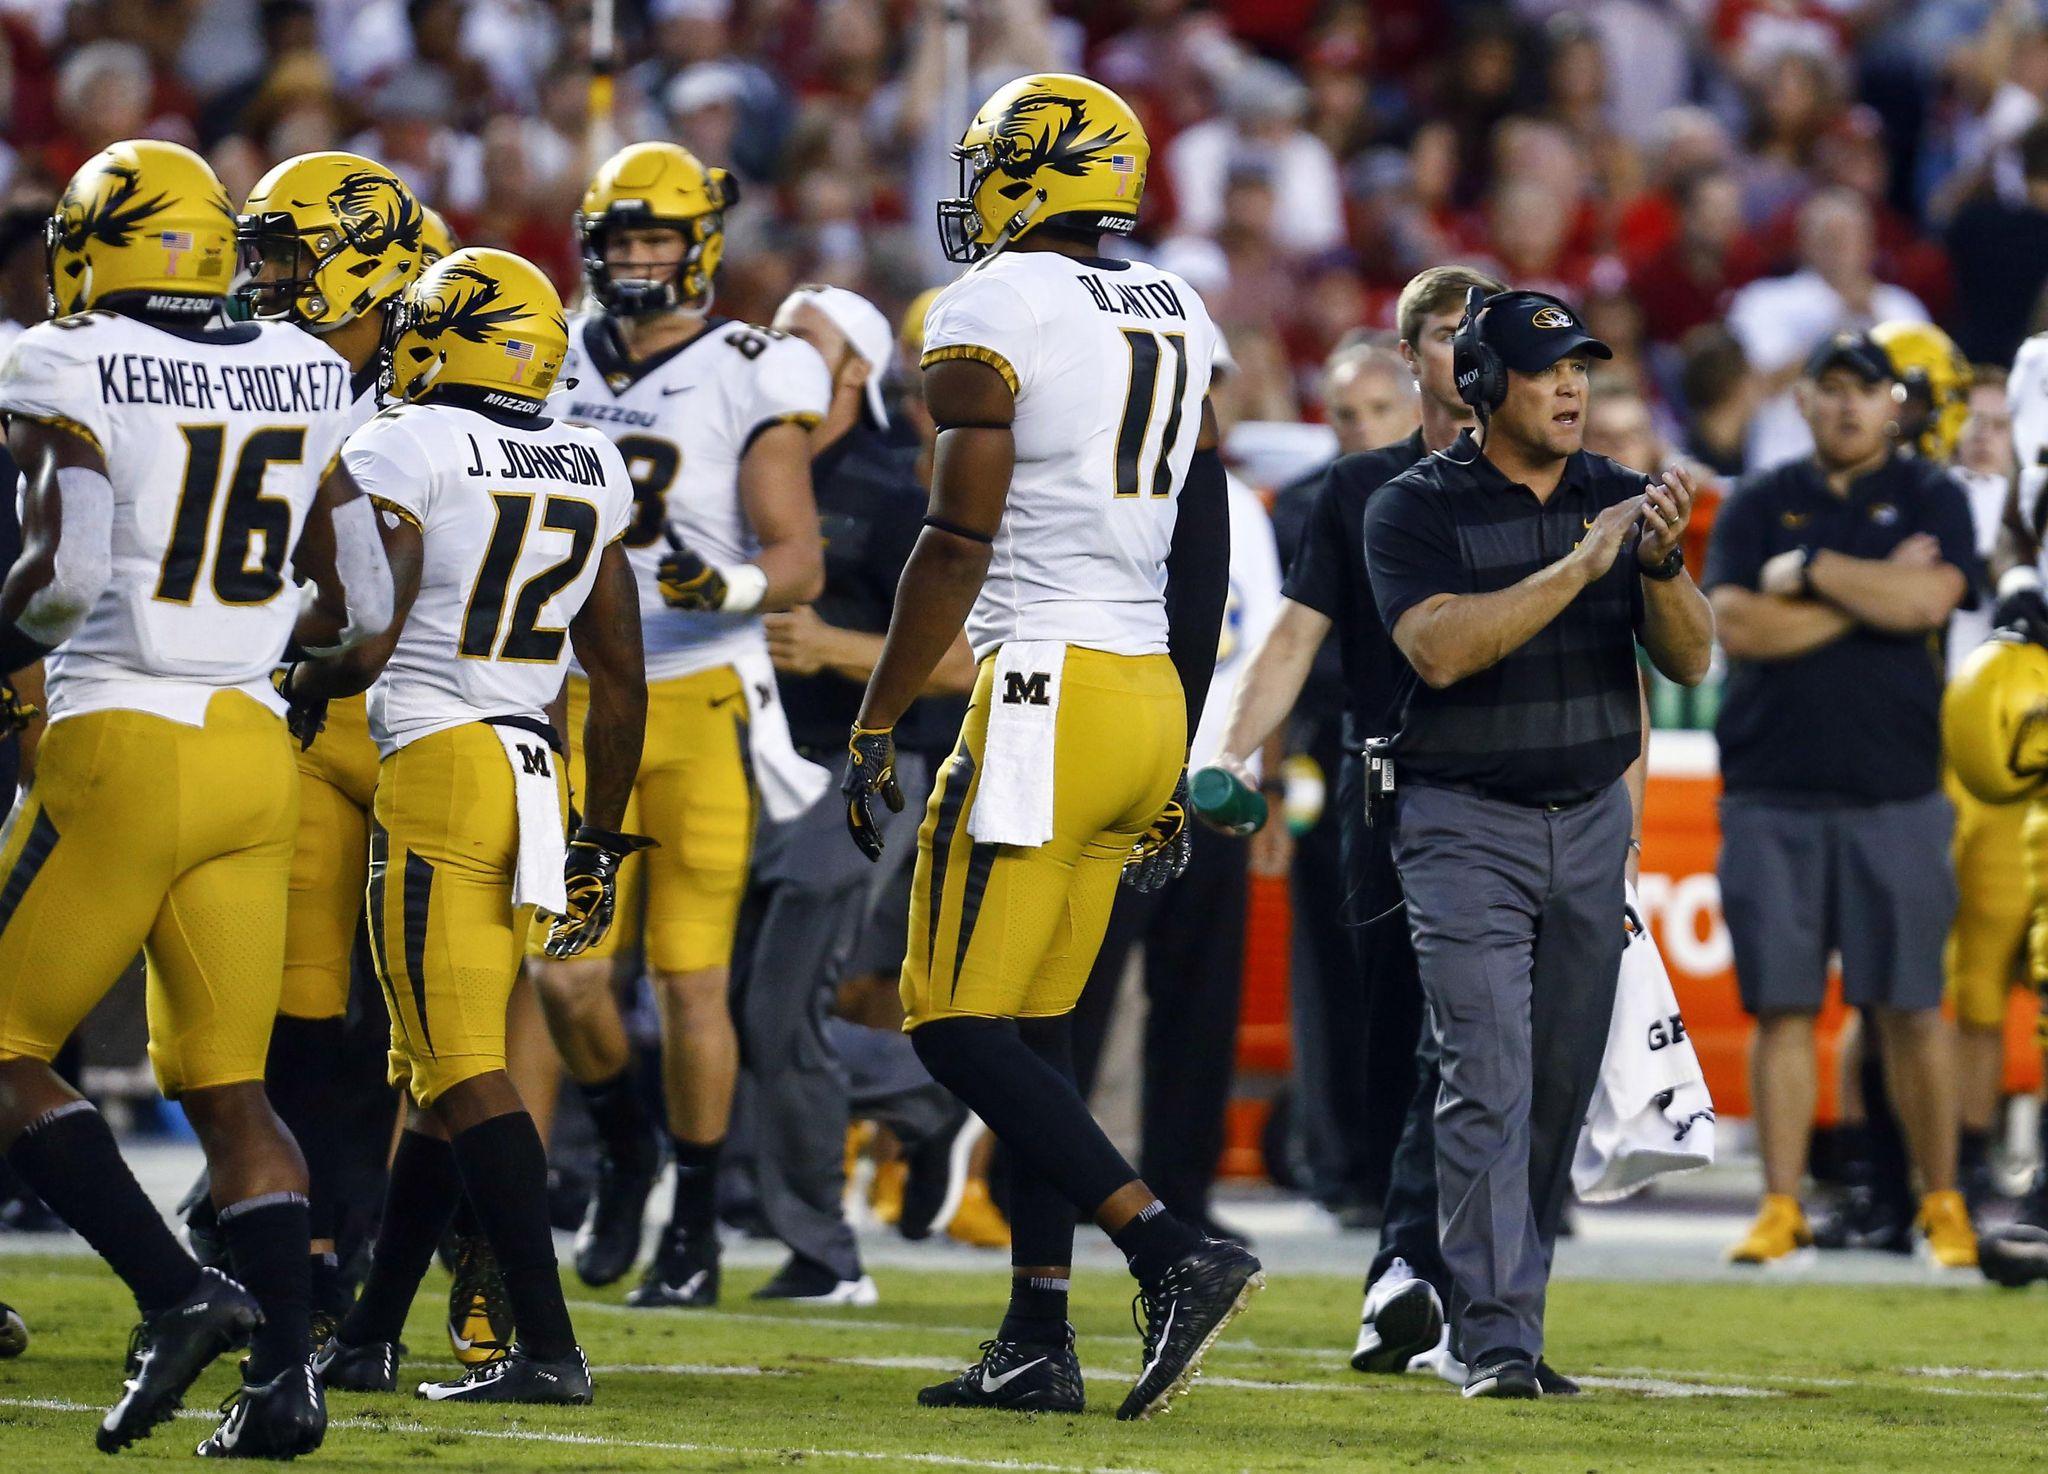 Missouri needs rebound victory in midst of losing streak - Washington Times